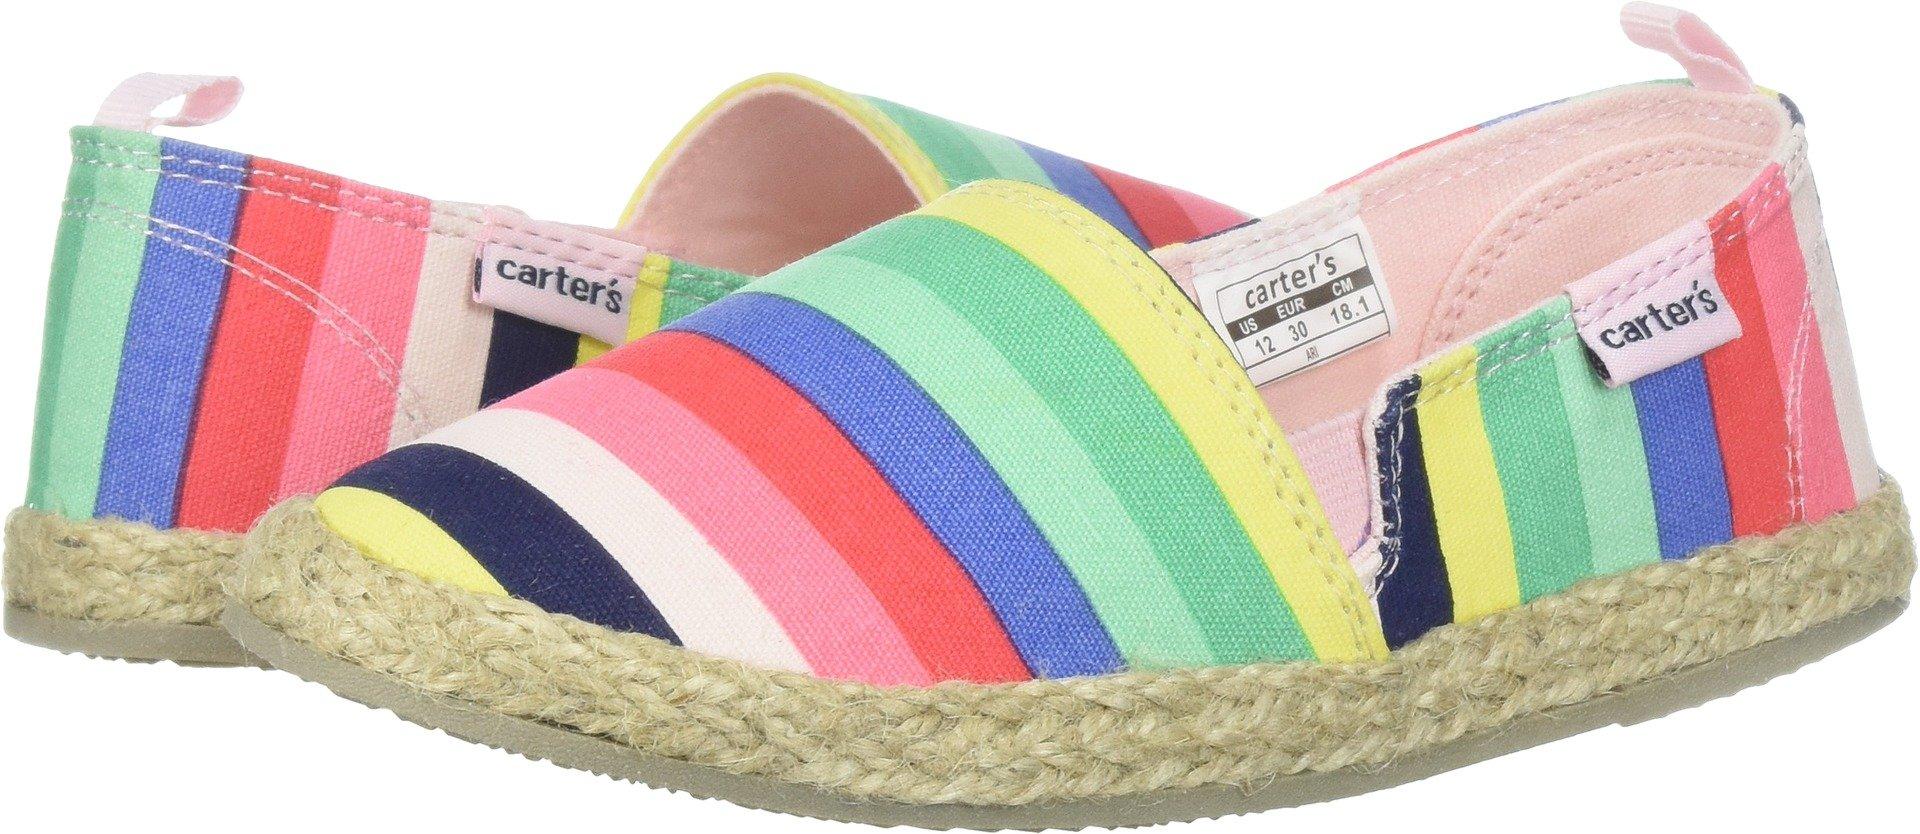 Carter's Girls' Ari Espadrille Slip-on Loafer Flat, Print, 10 M US Toddler